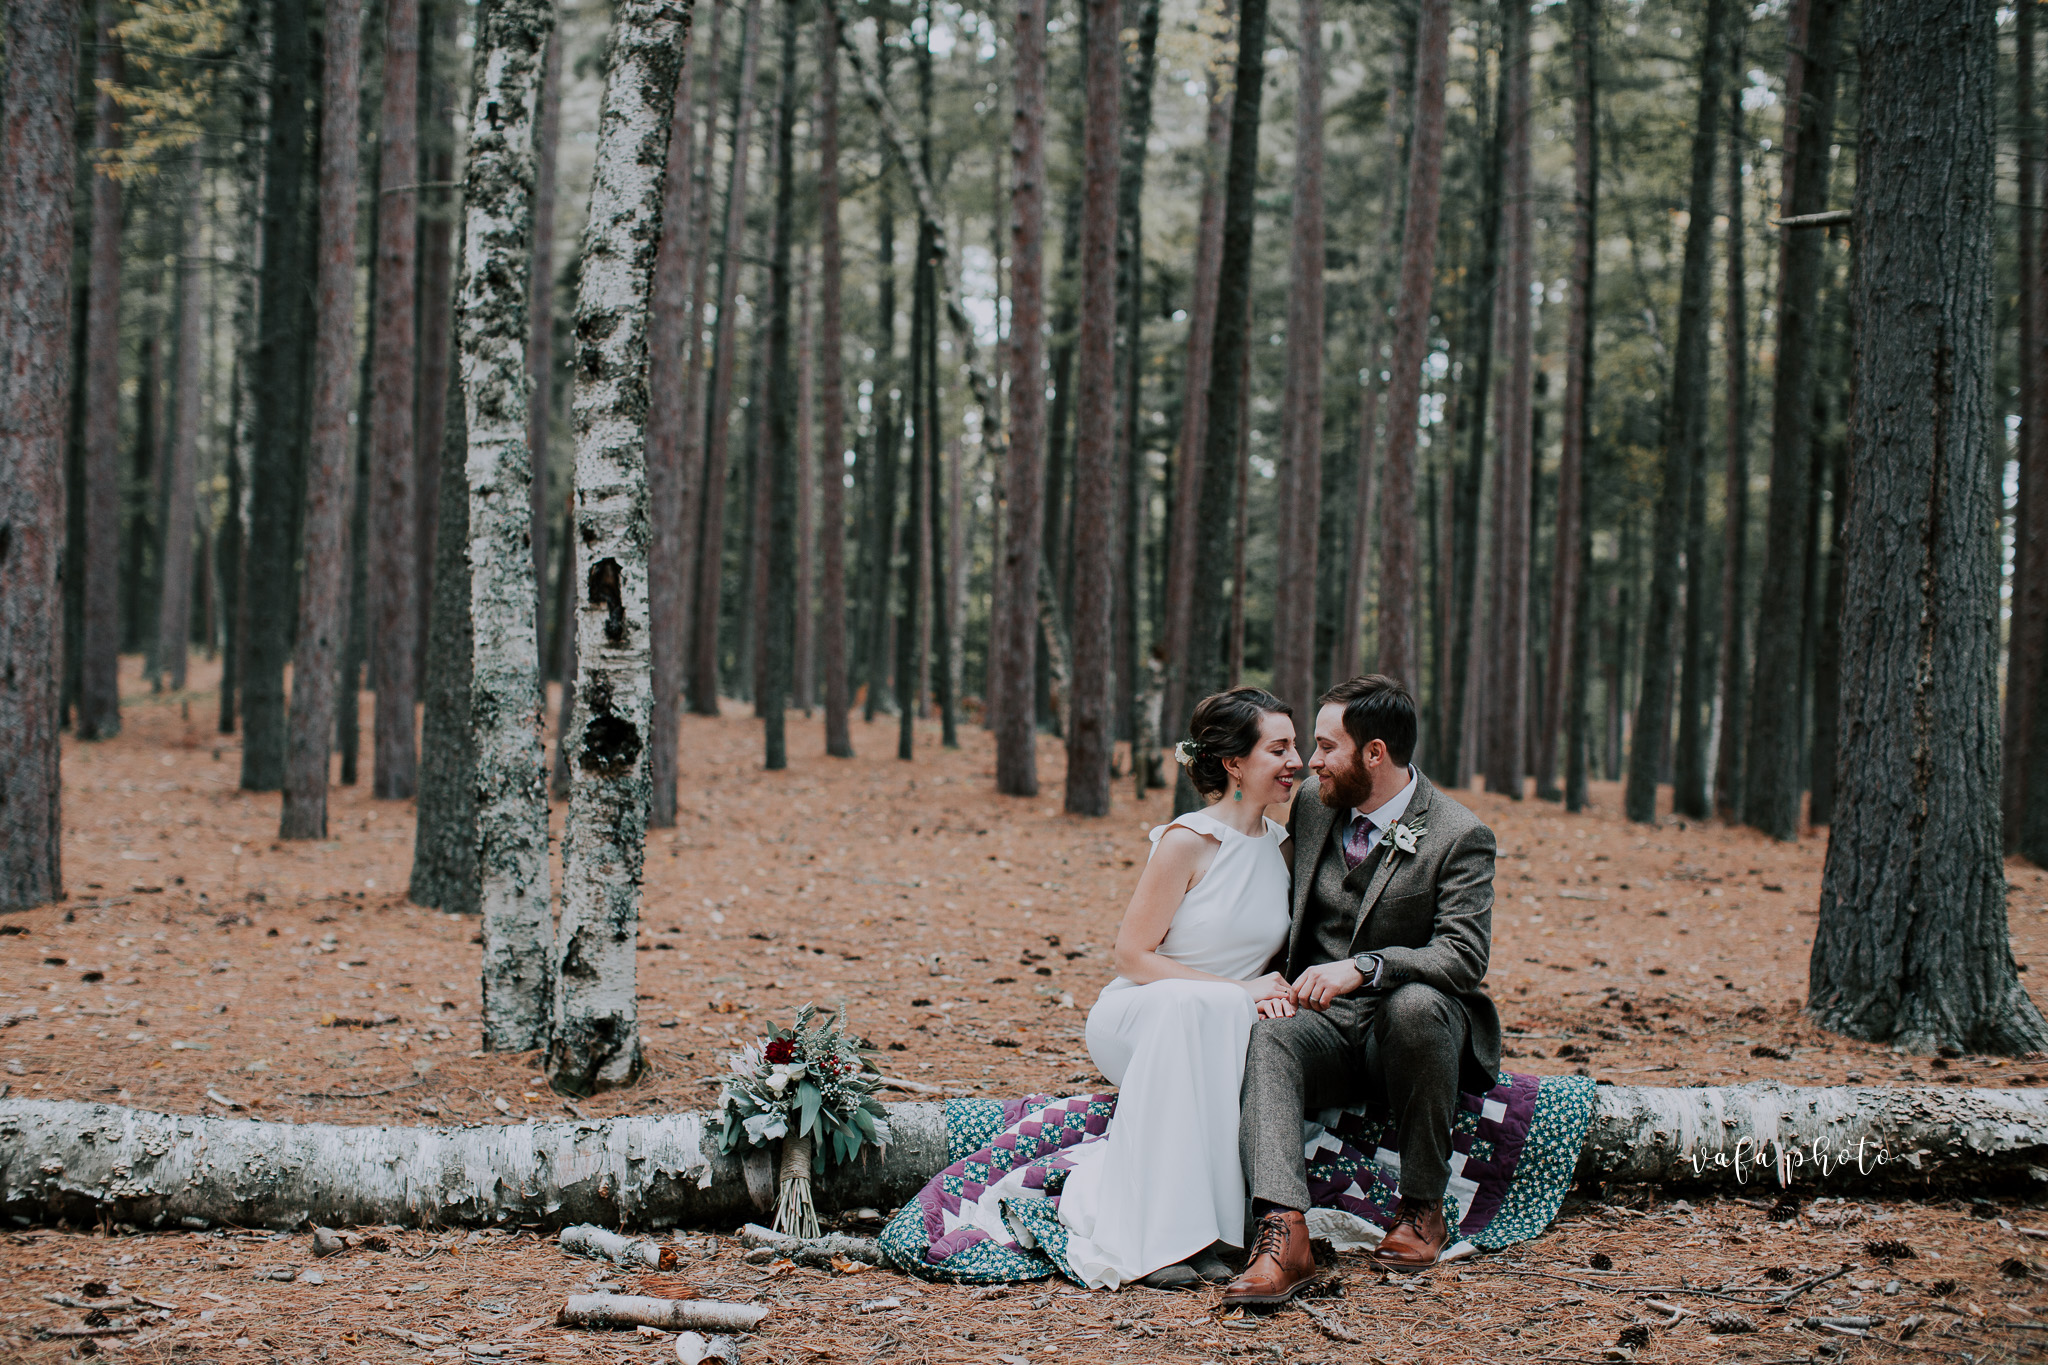 Little-Presque-Isle-Michigan-Wedding-Kim-Kyle-Vafa-Photo-403.jpg